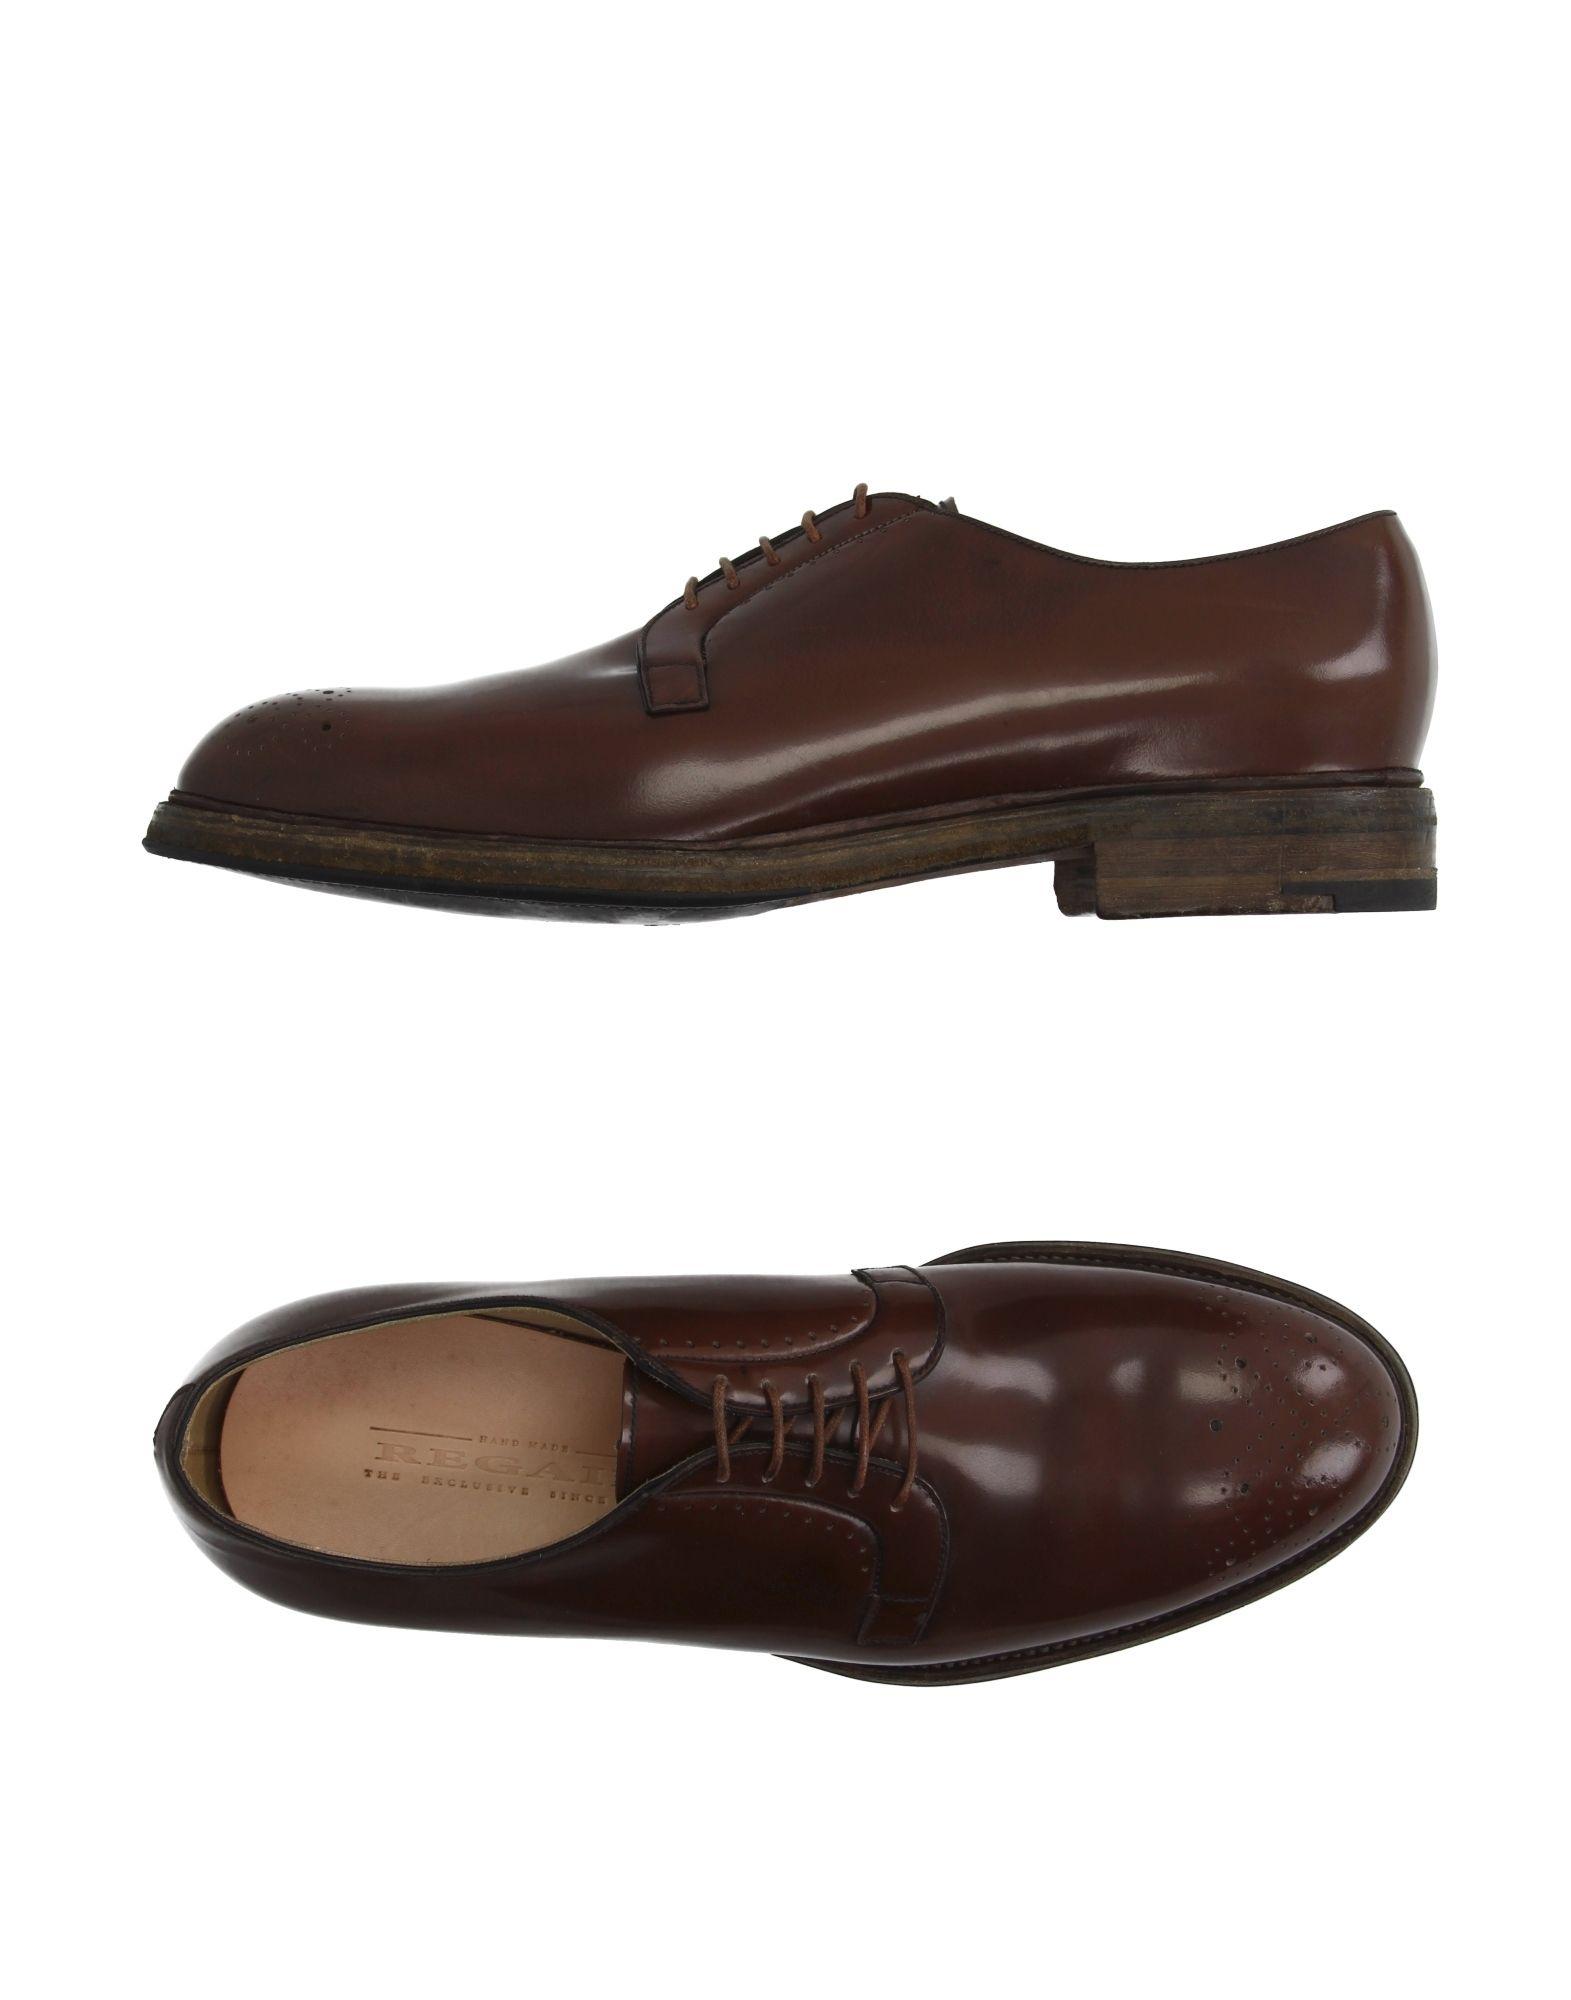 Negozi regain scarpe